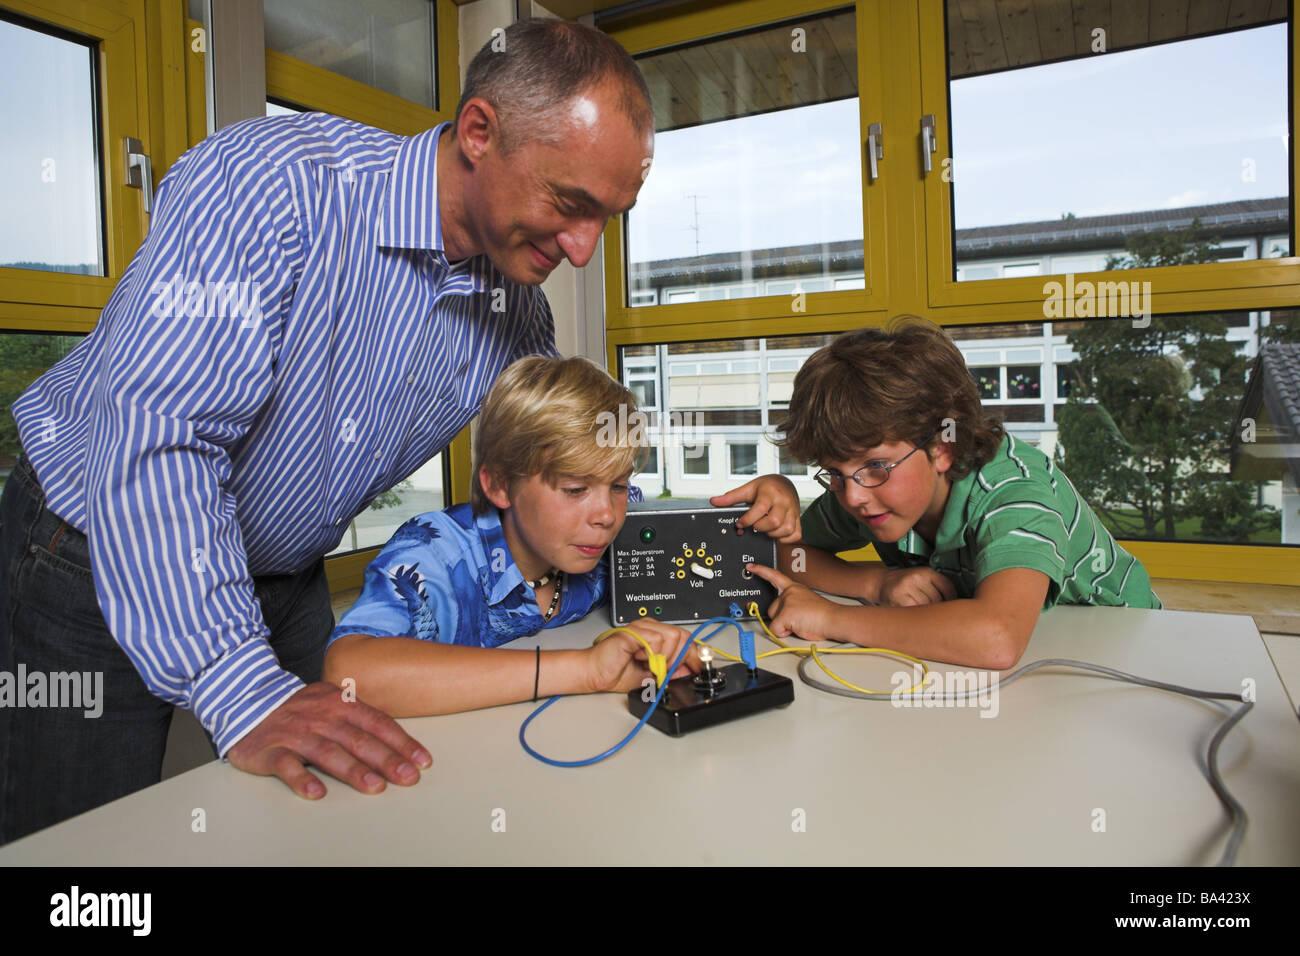 School classrooms instruction physics teachers students